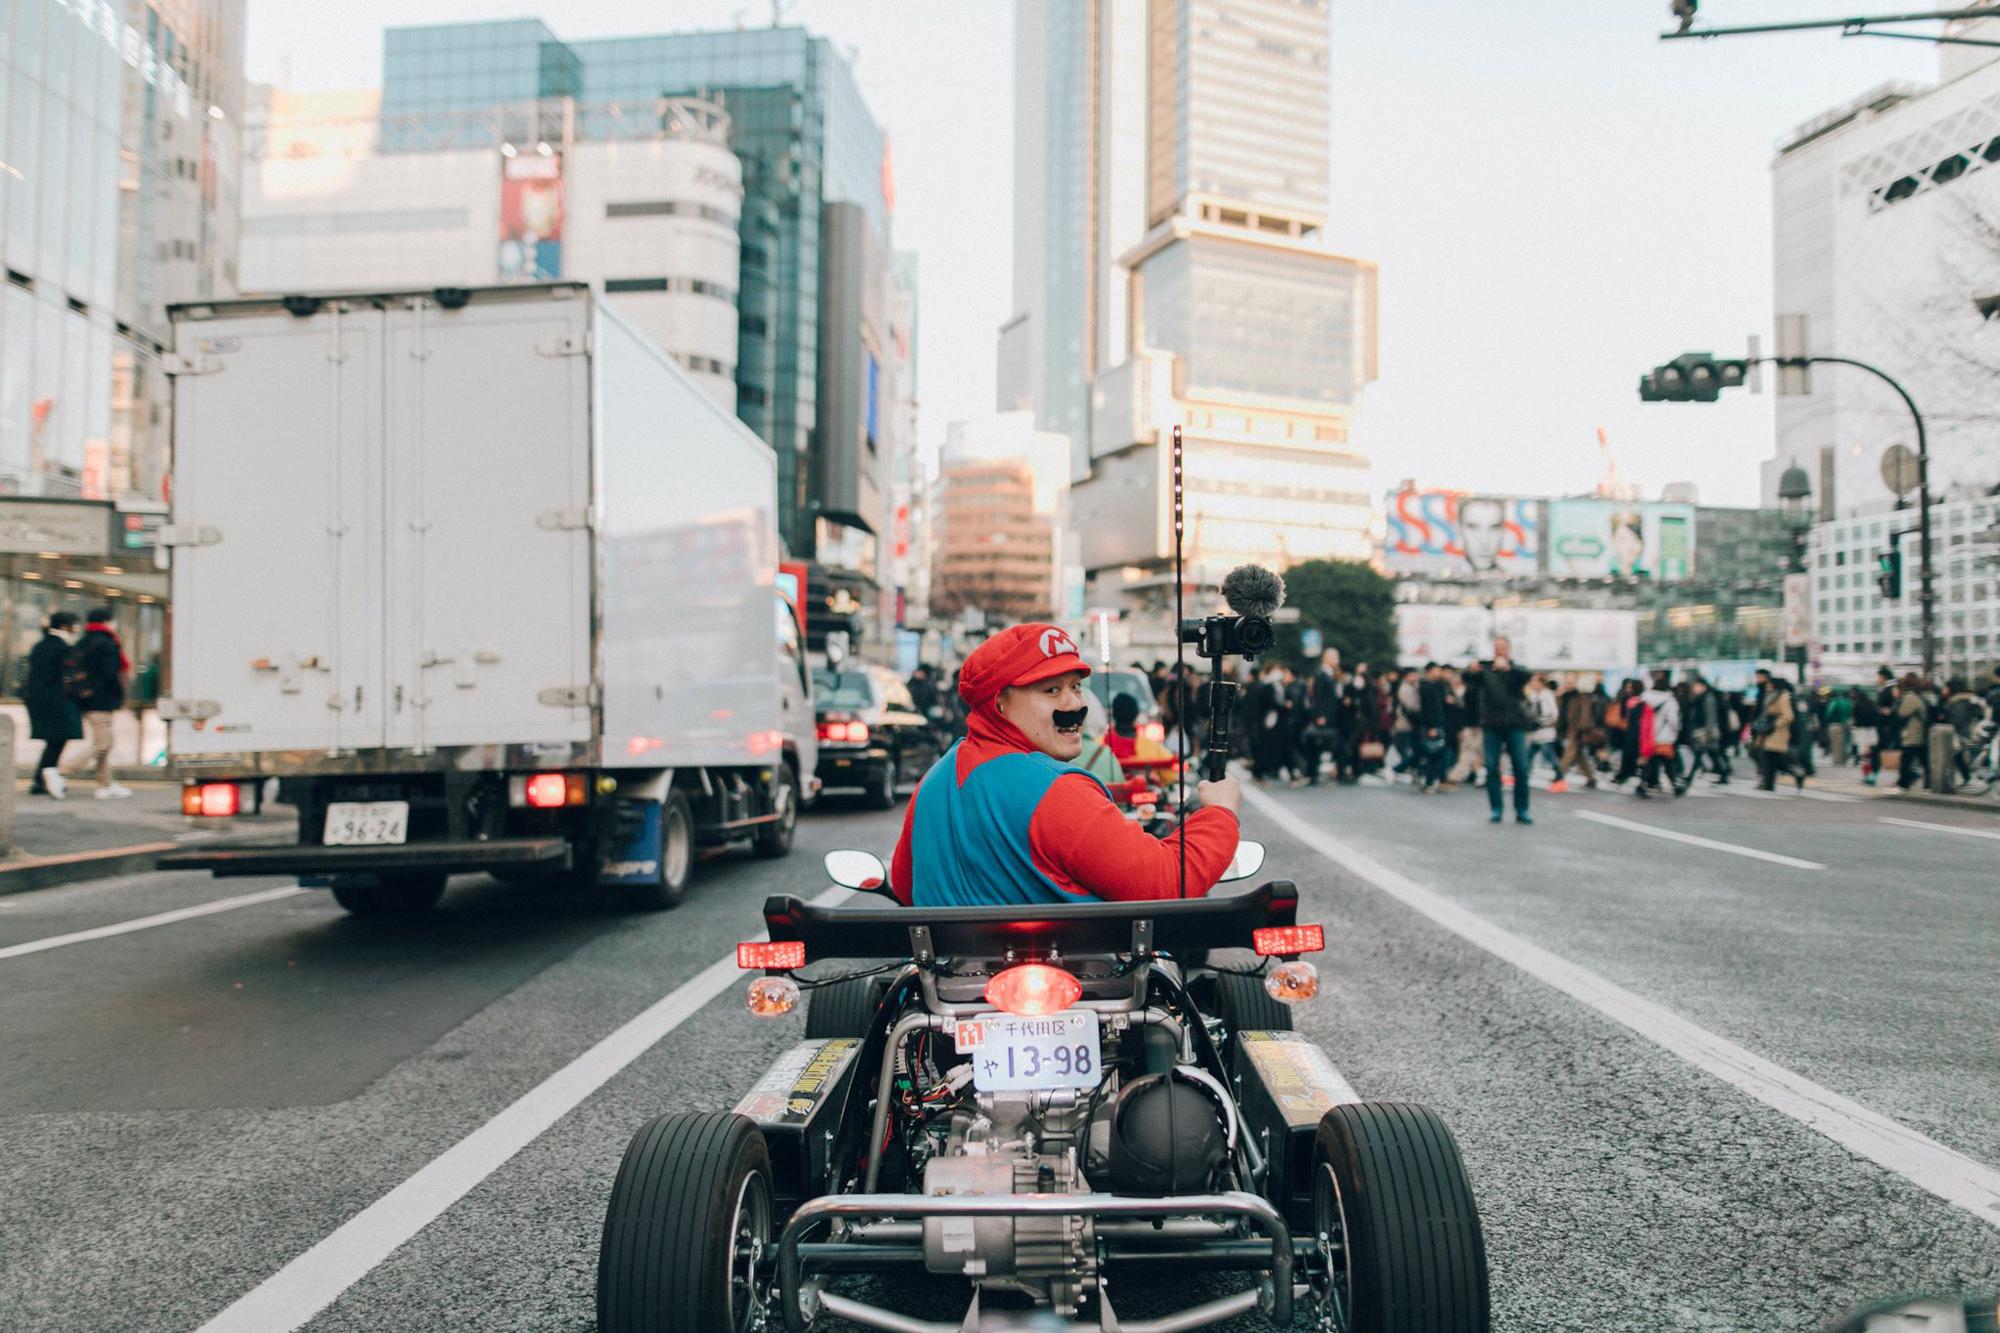 008-Mario.jpg